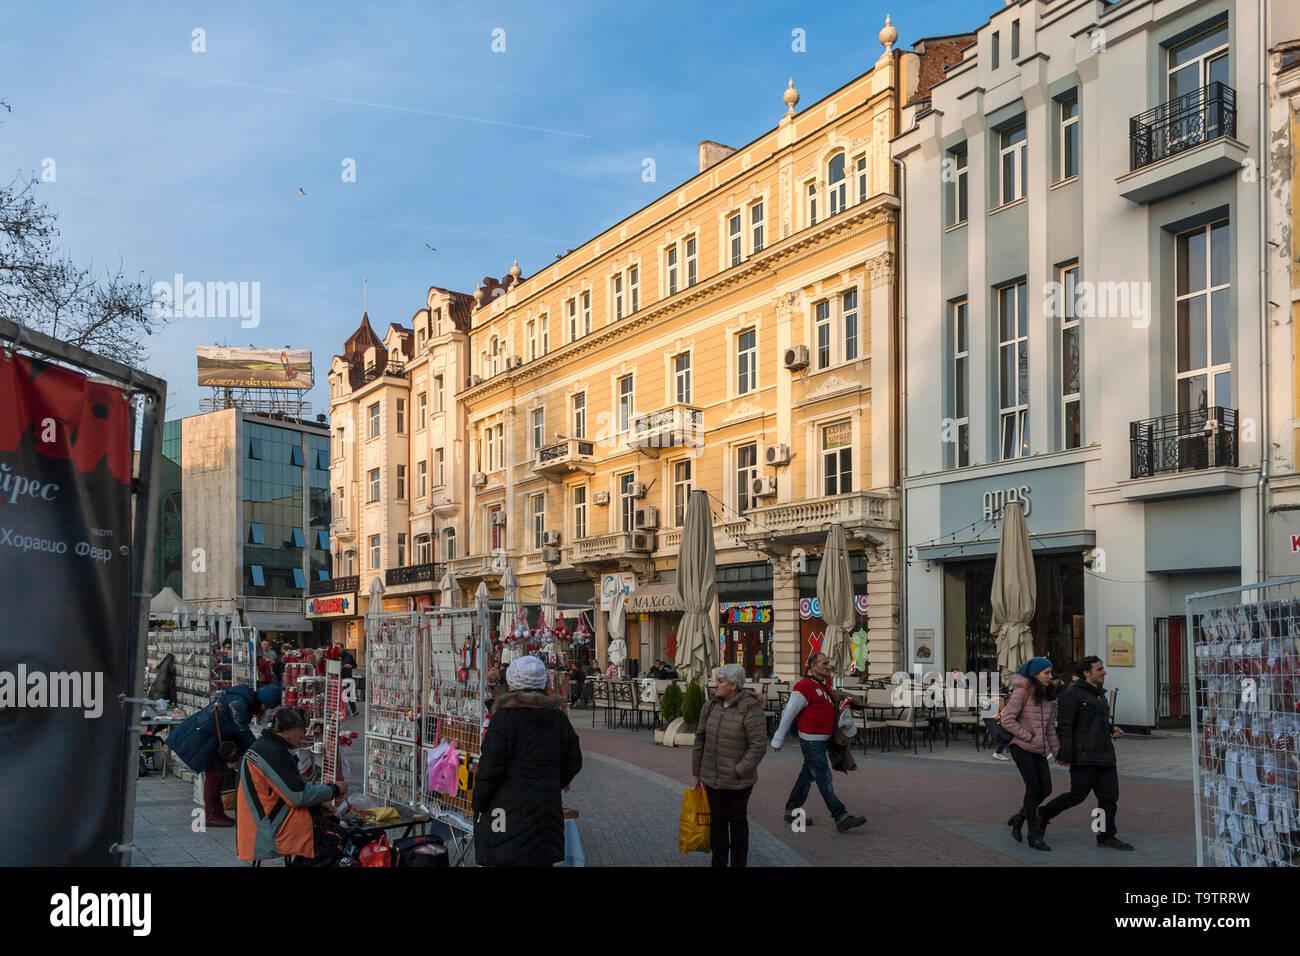 PLOVDIV, BULGARIA - FEBRUARY 10, 2019: Sunset view of central pedestrian street Knyaz Alexander I in city of Plovdiv, Bulgaria - Stock Image